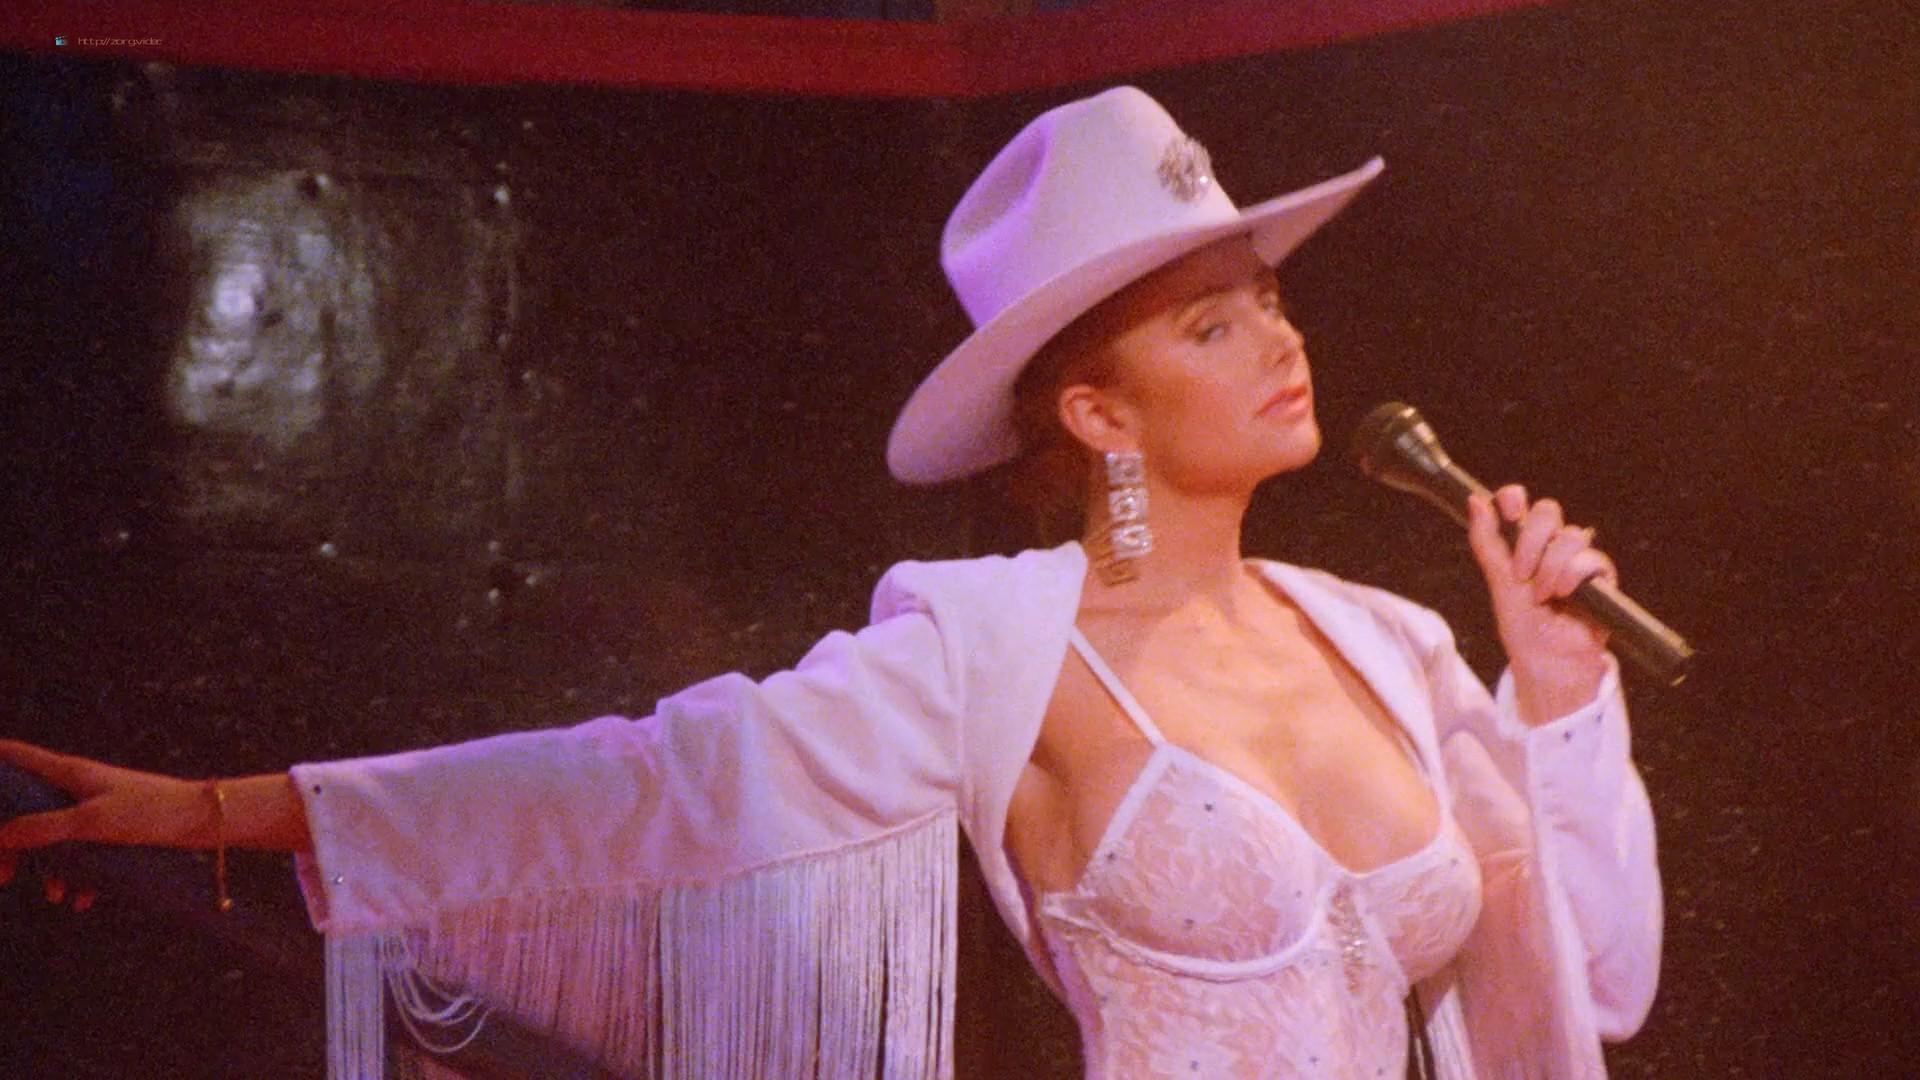 Dona Speir nude Pandora Peaks, Carolyn Liu and others nude too - Do or Die (1991) 1080p BluRay (16)